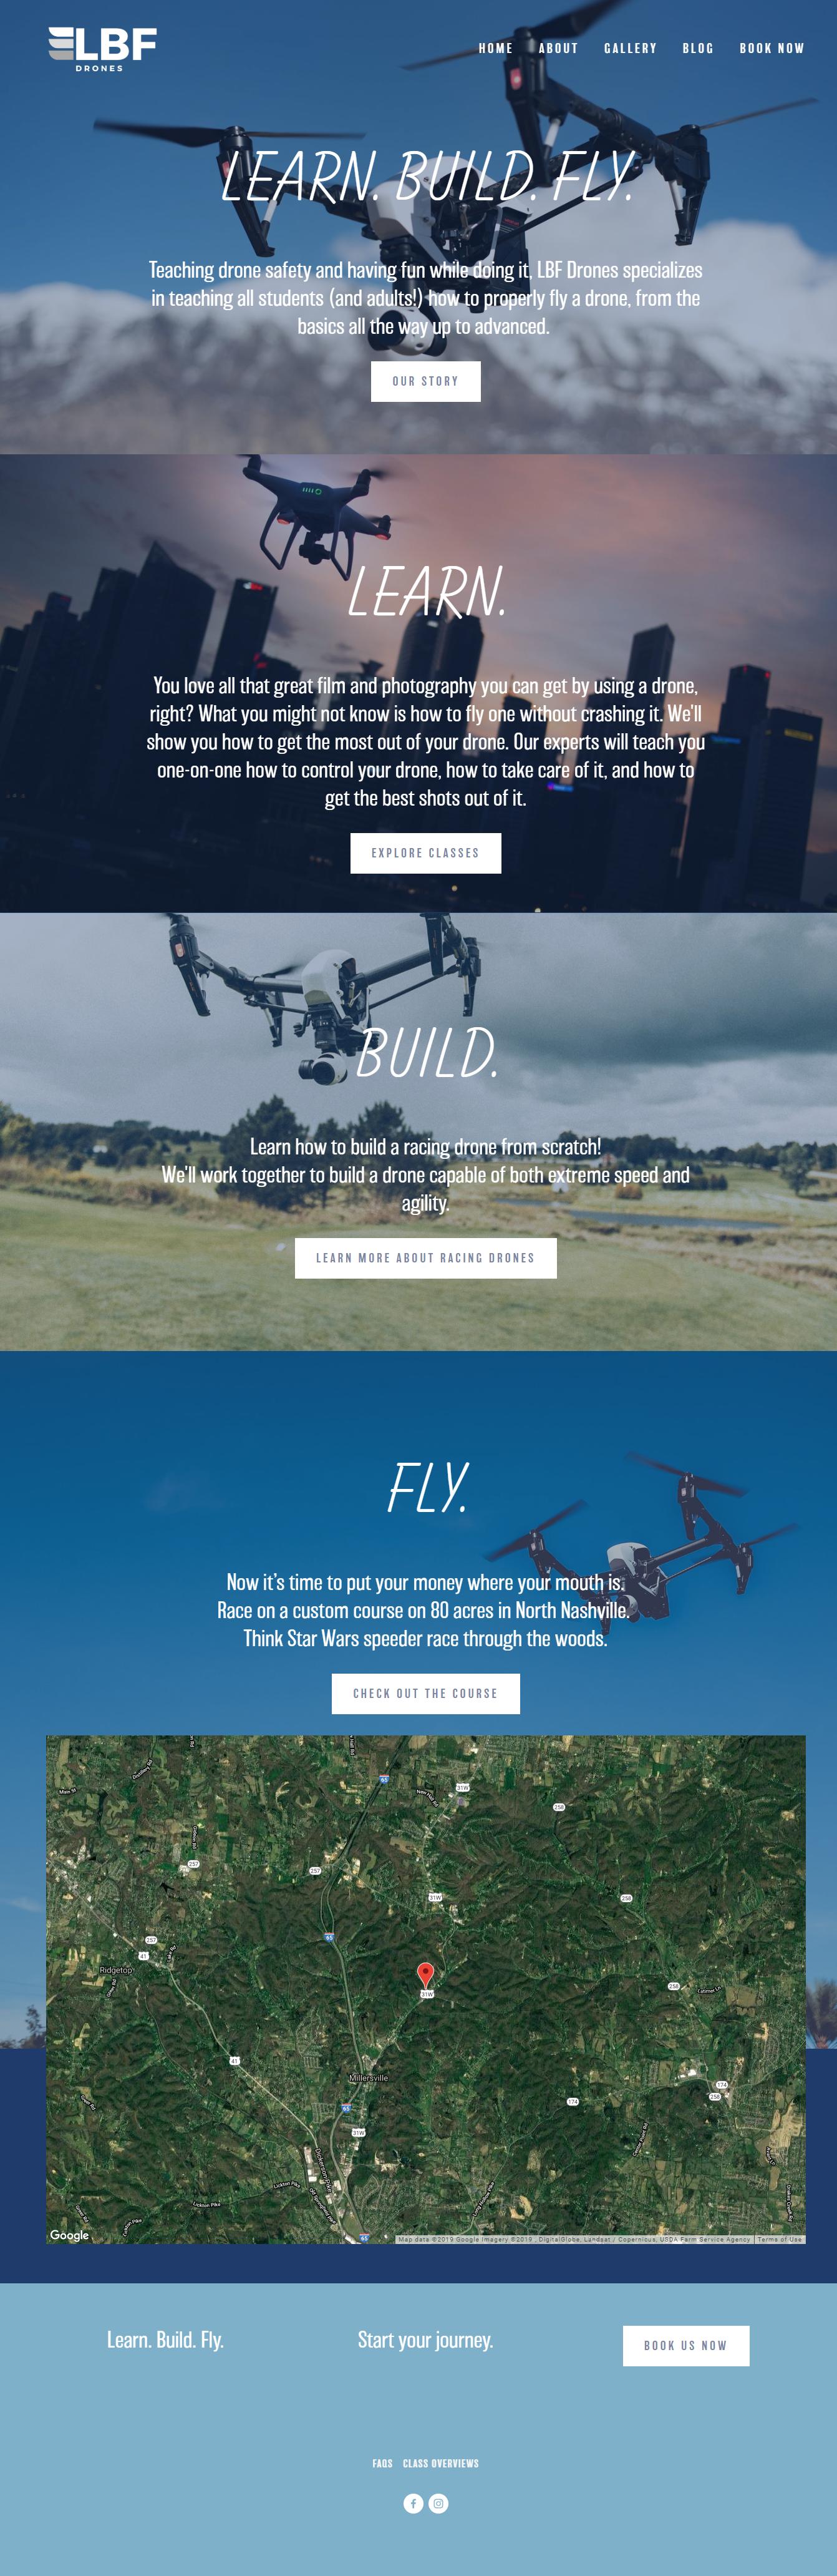 LBF Drones Full.png